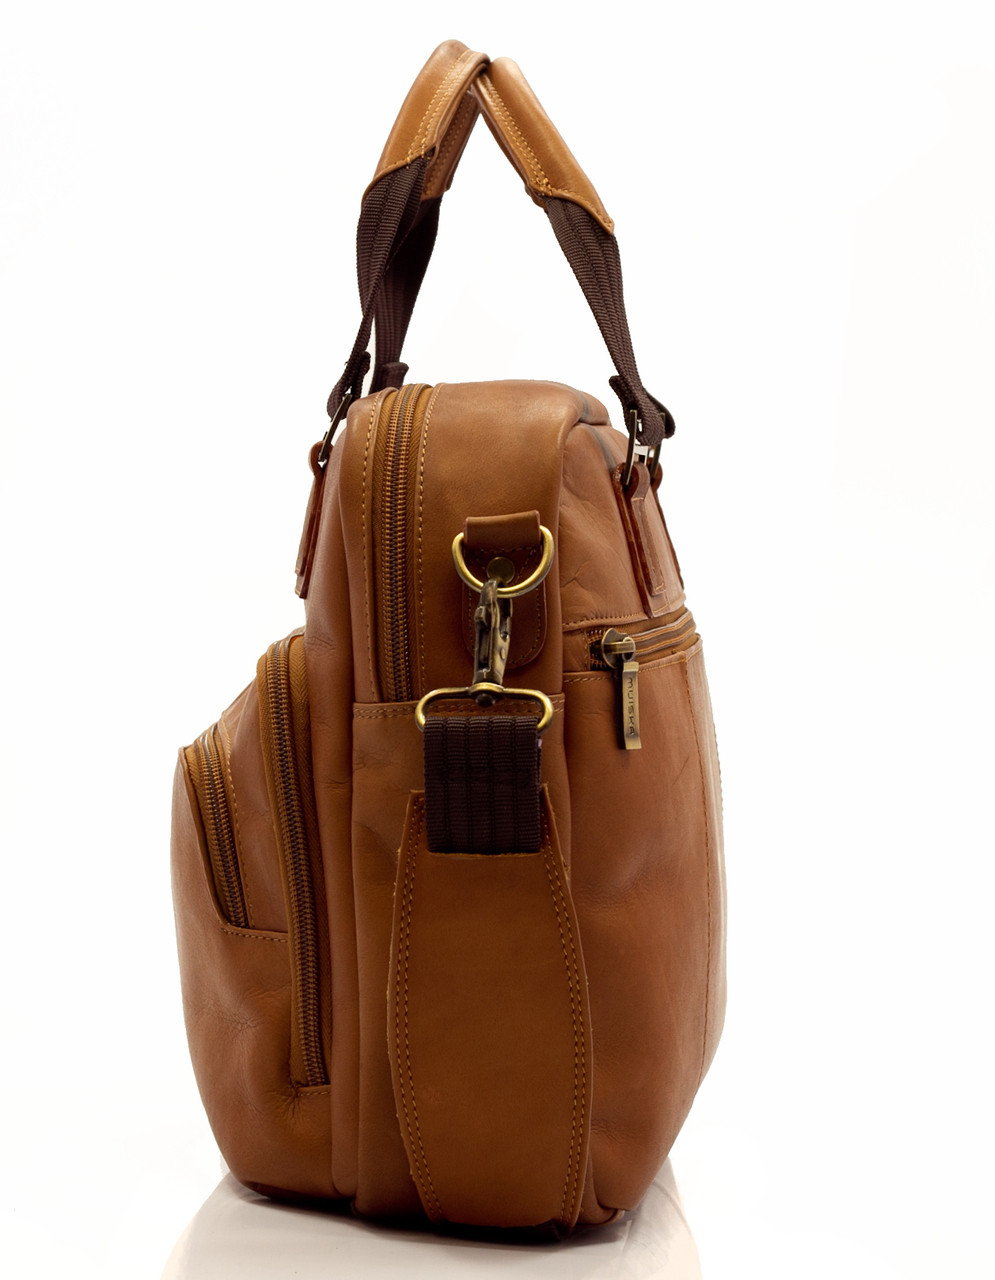 Muiska - Paris - Leather Laptop Briefcase - detachable and adjustable strap